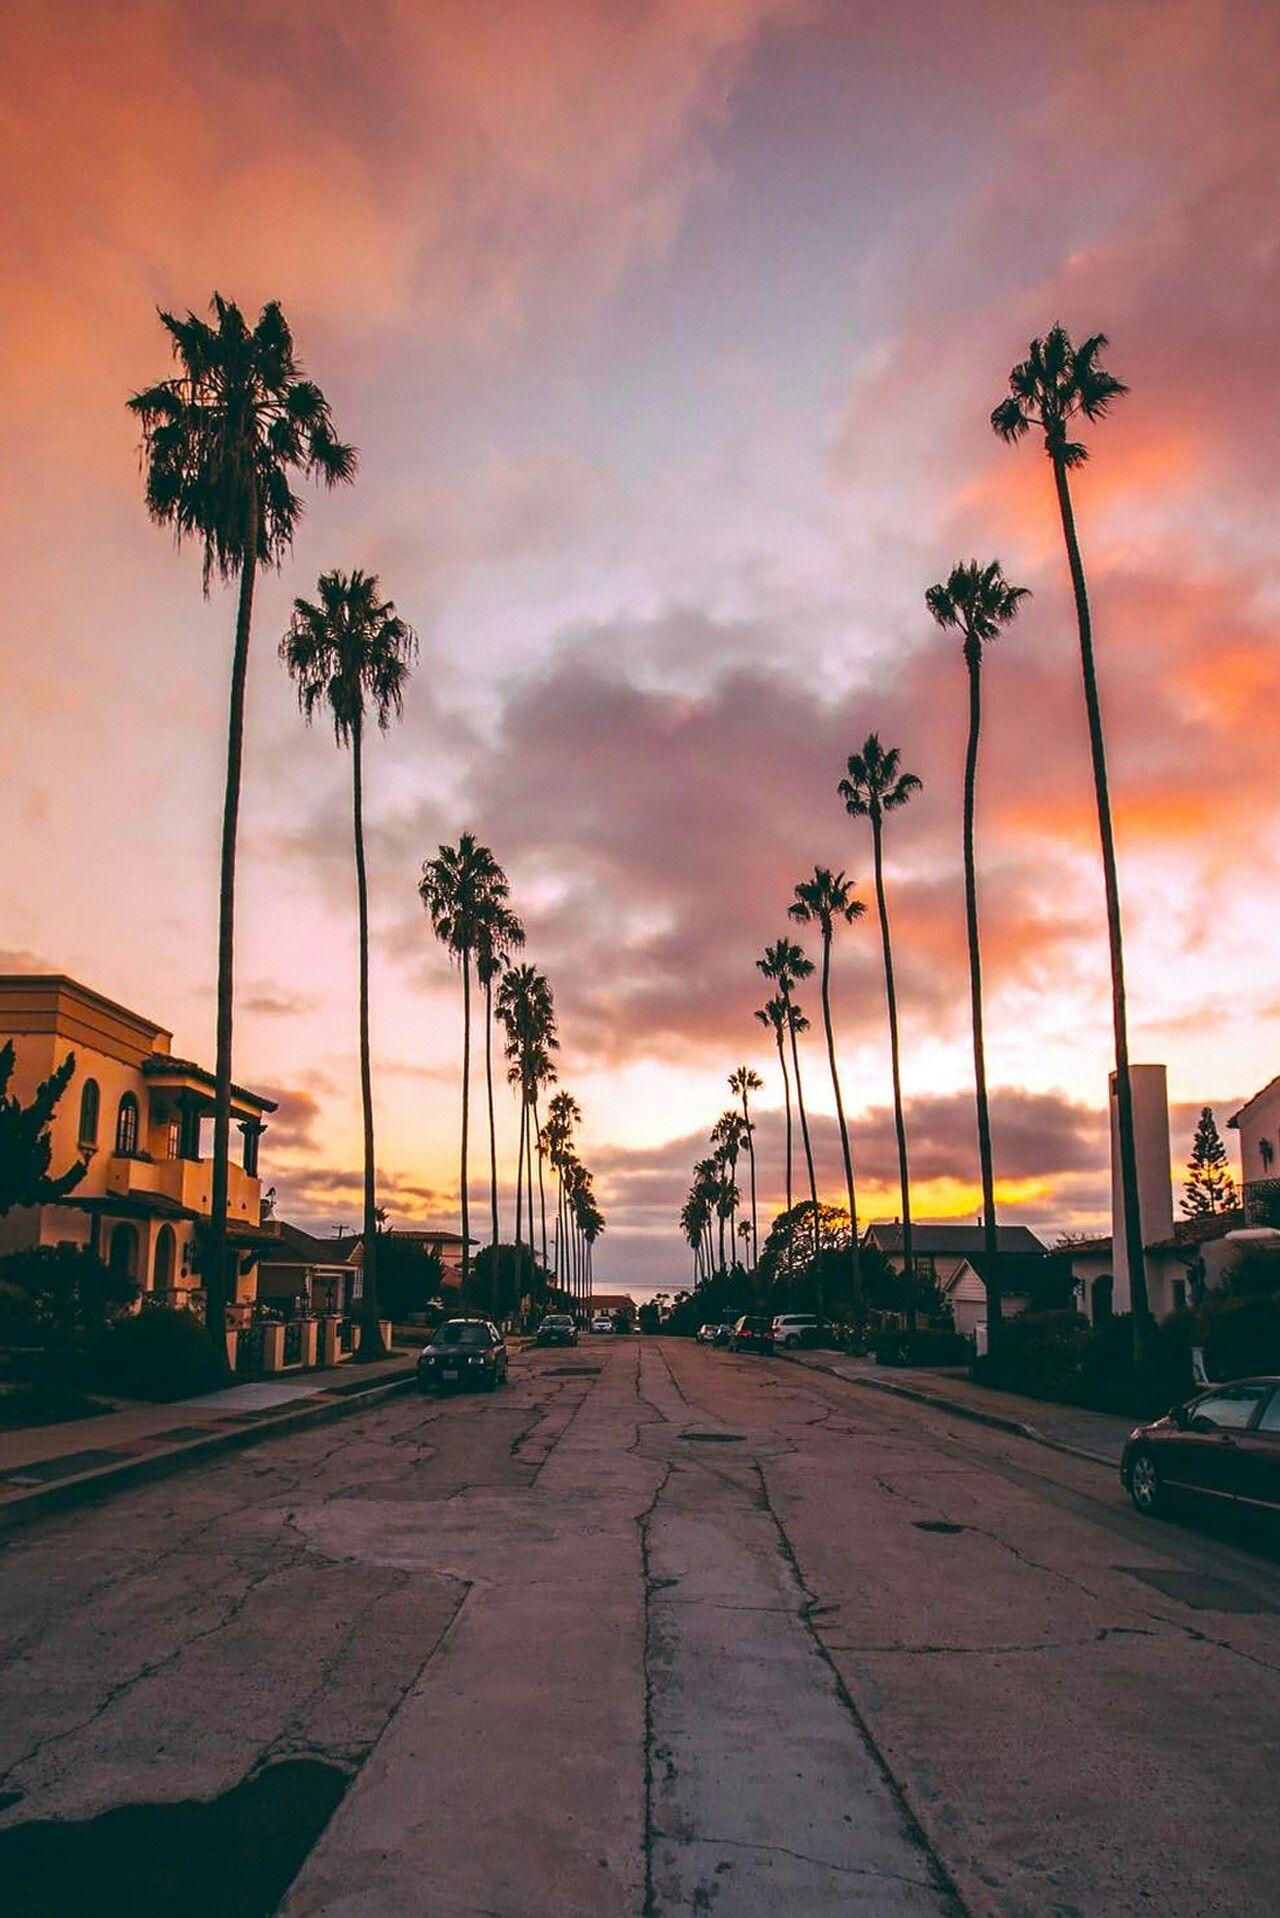 Sunset La Palm Trees Background - HD Wallpaper